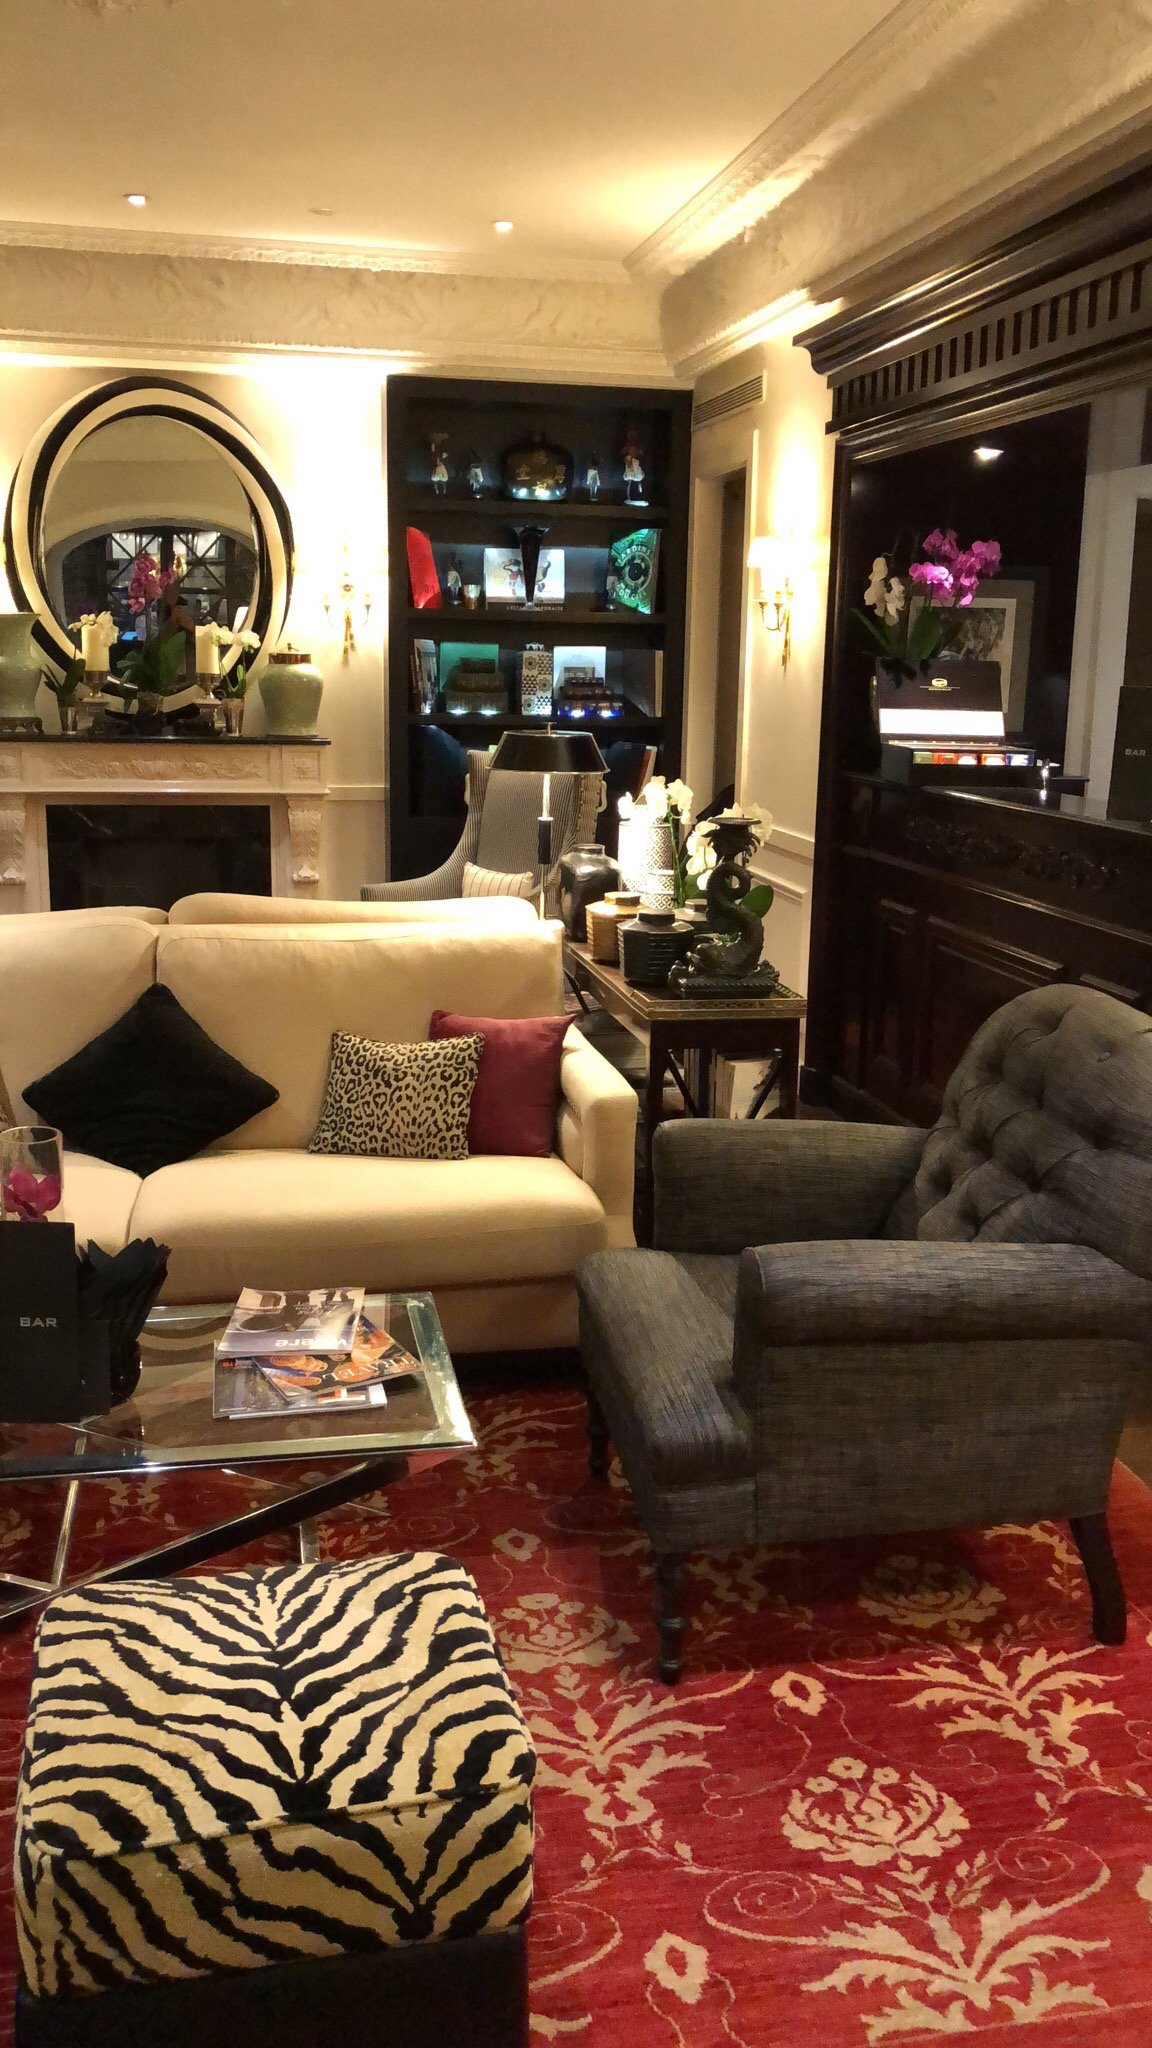 Hotel Keppler UPDATED 2017 Prices Reviews & s Paris